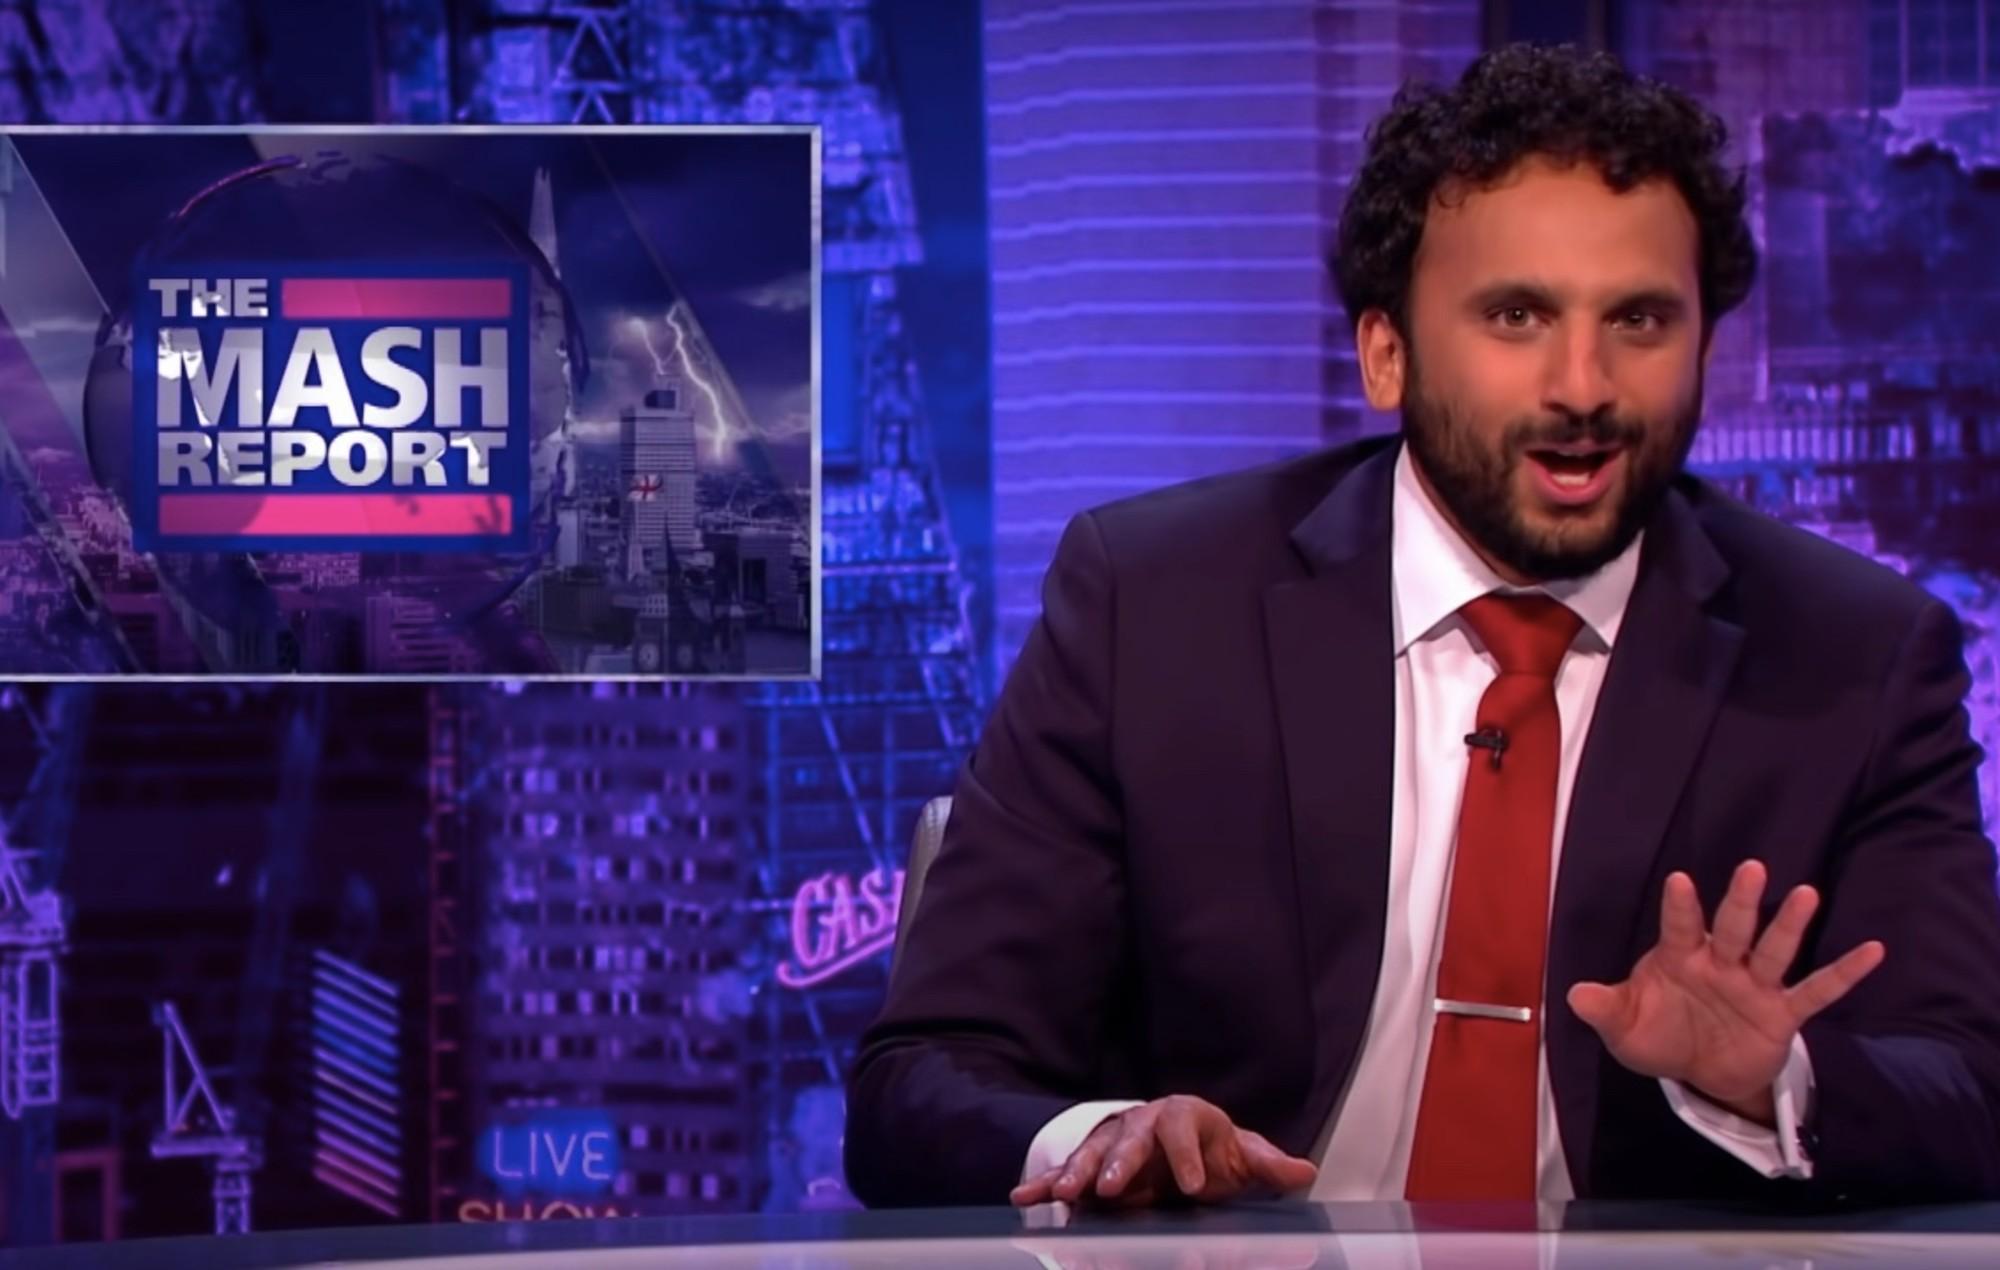 'The Mash Report' with Nish Kumar